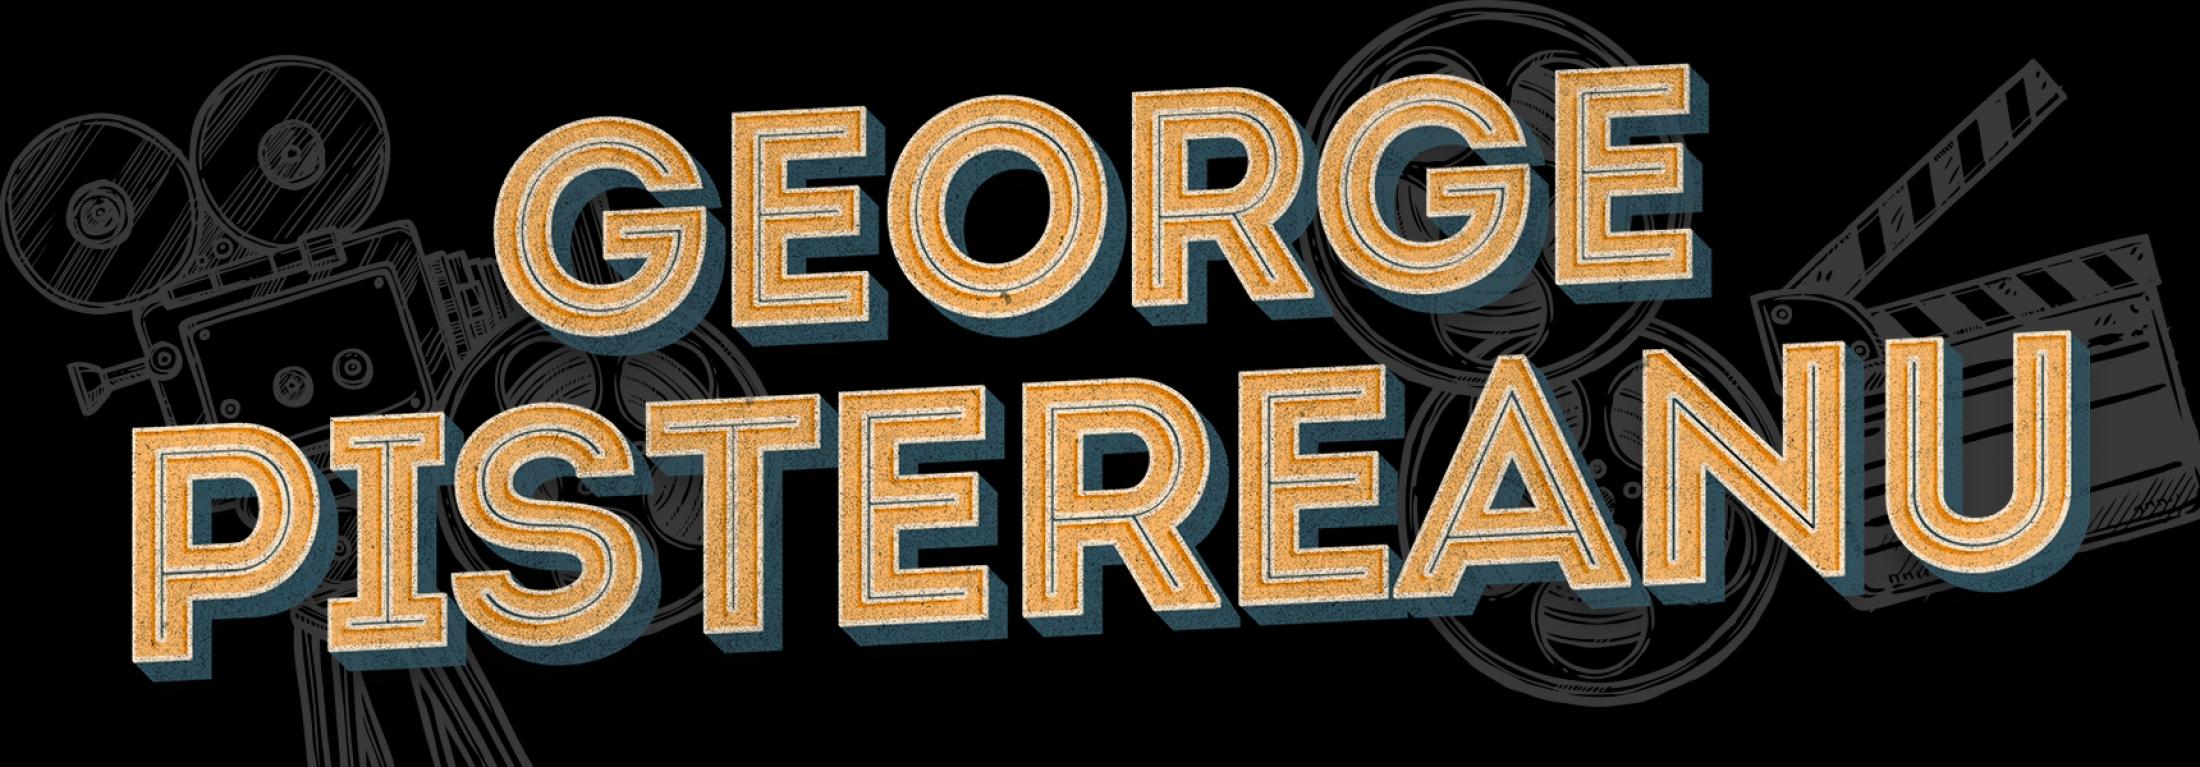 George Pistereanu